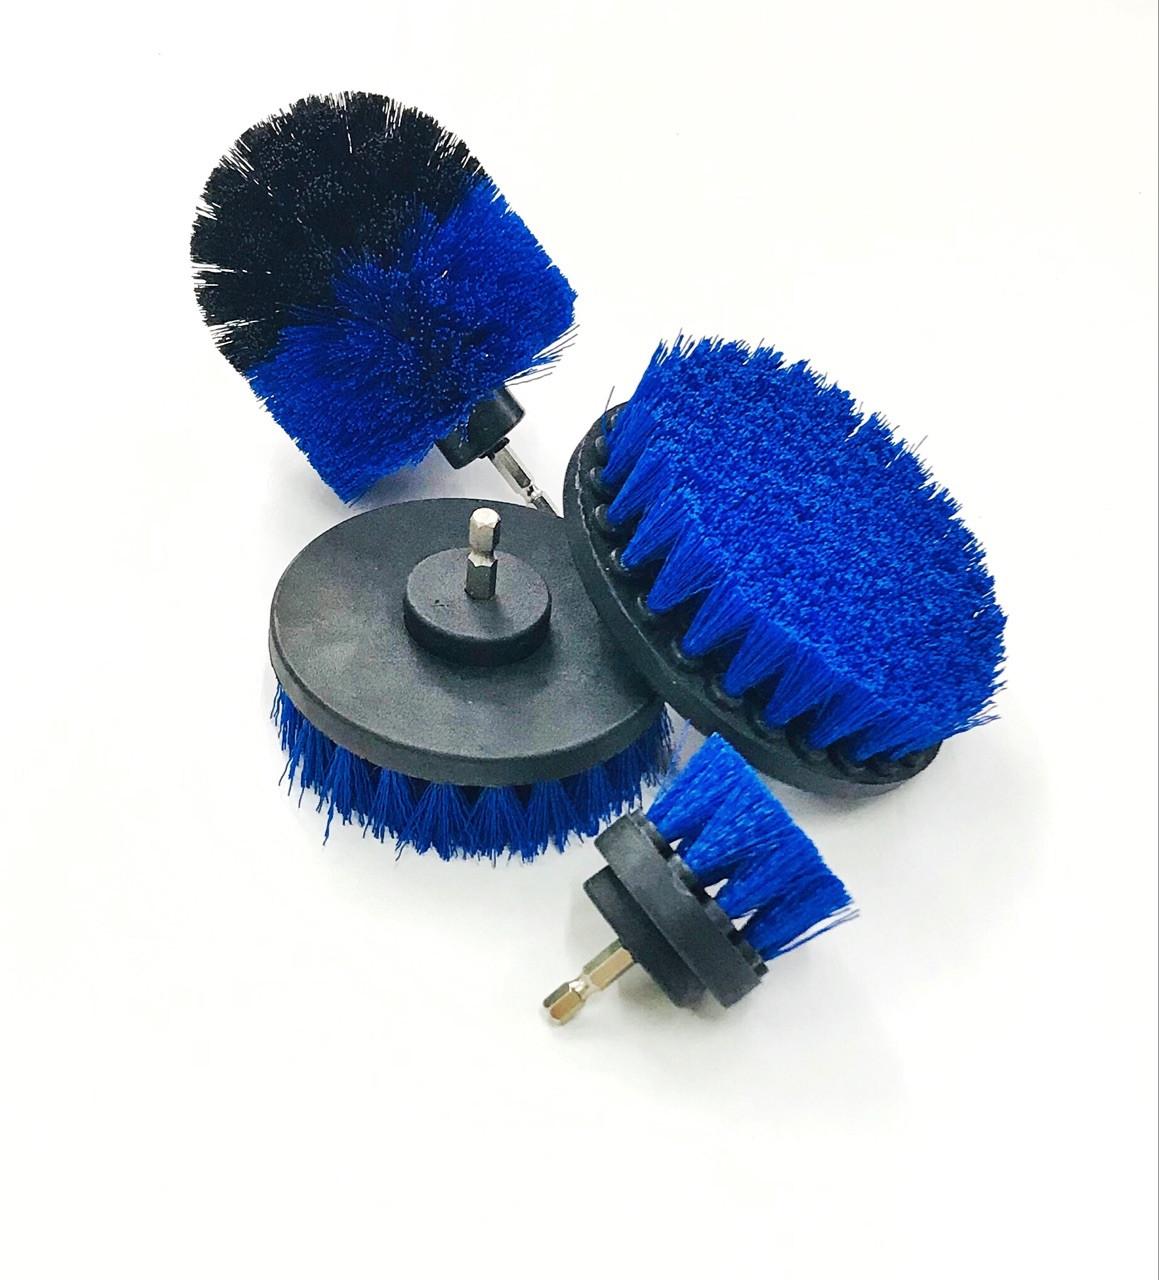 Щетка на дрель (шуруповерт) для чистки текстиля, синяя от Chemical Guys